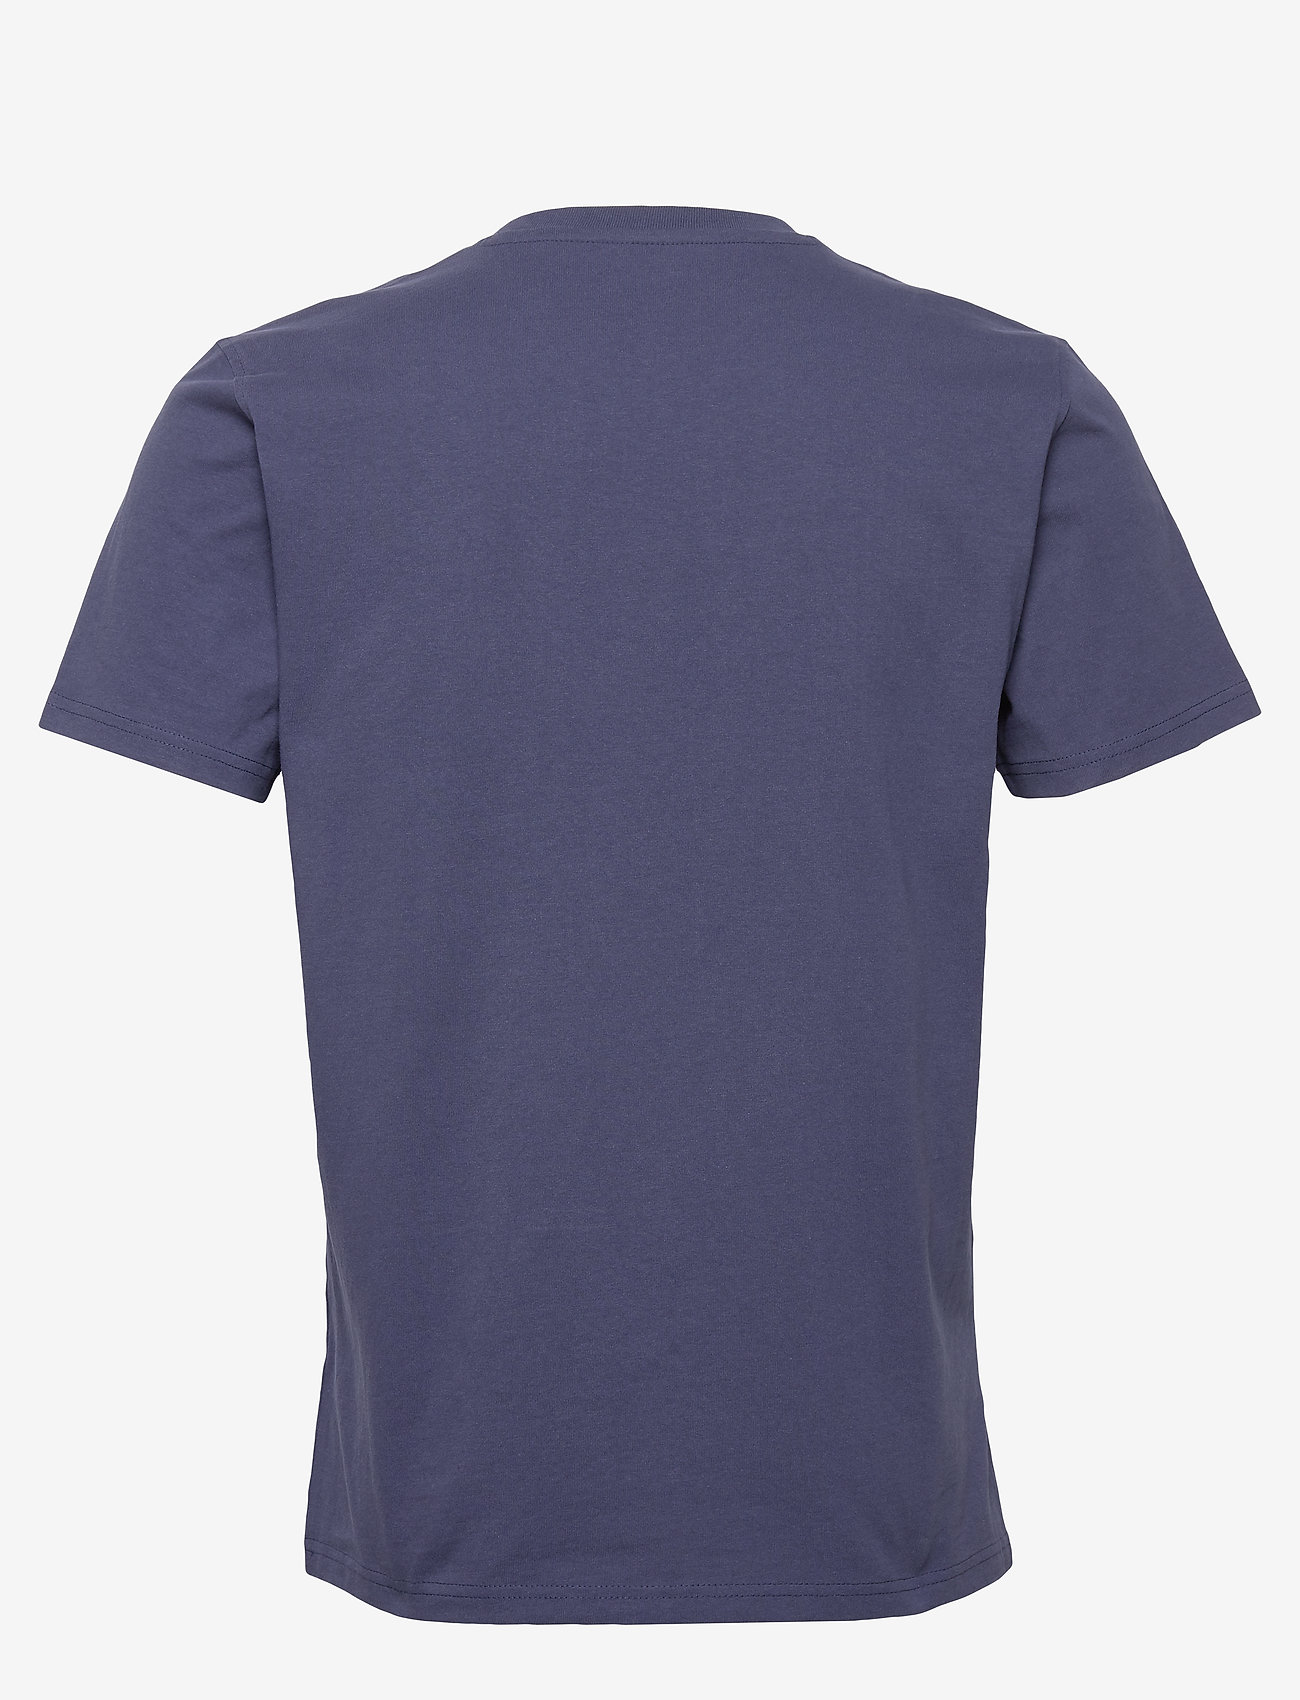 Lee Jeans - SS POCKET TEE - basic t-shirts - dark navy - 1